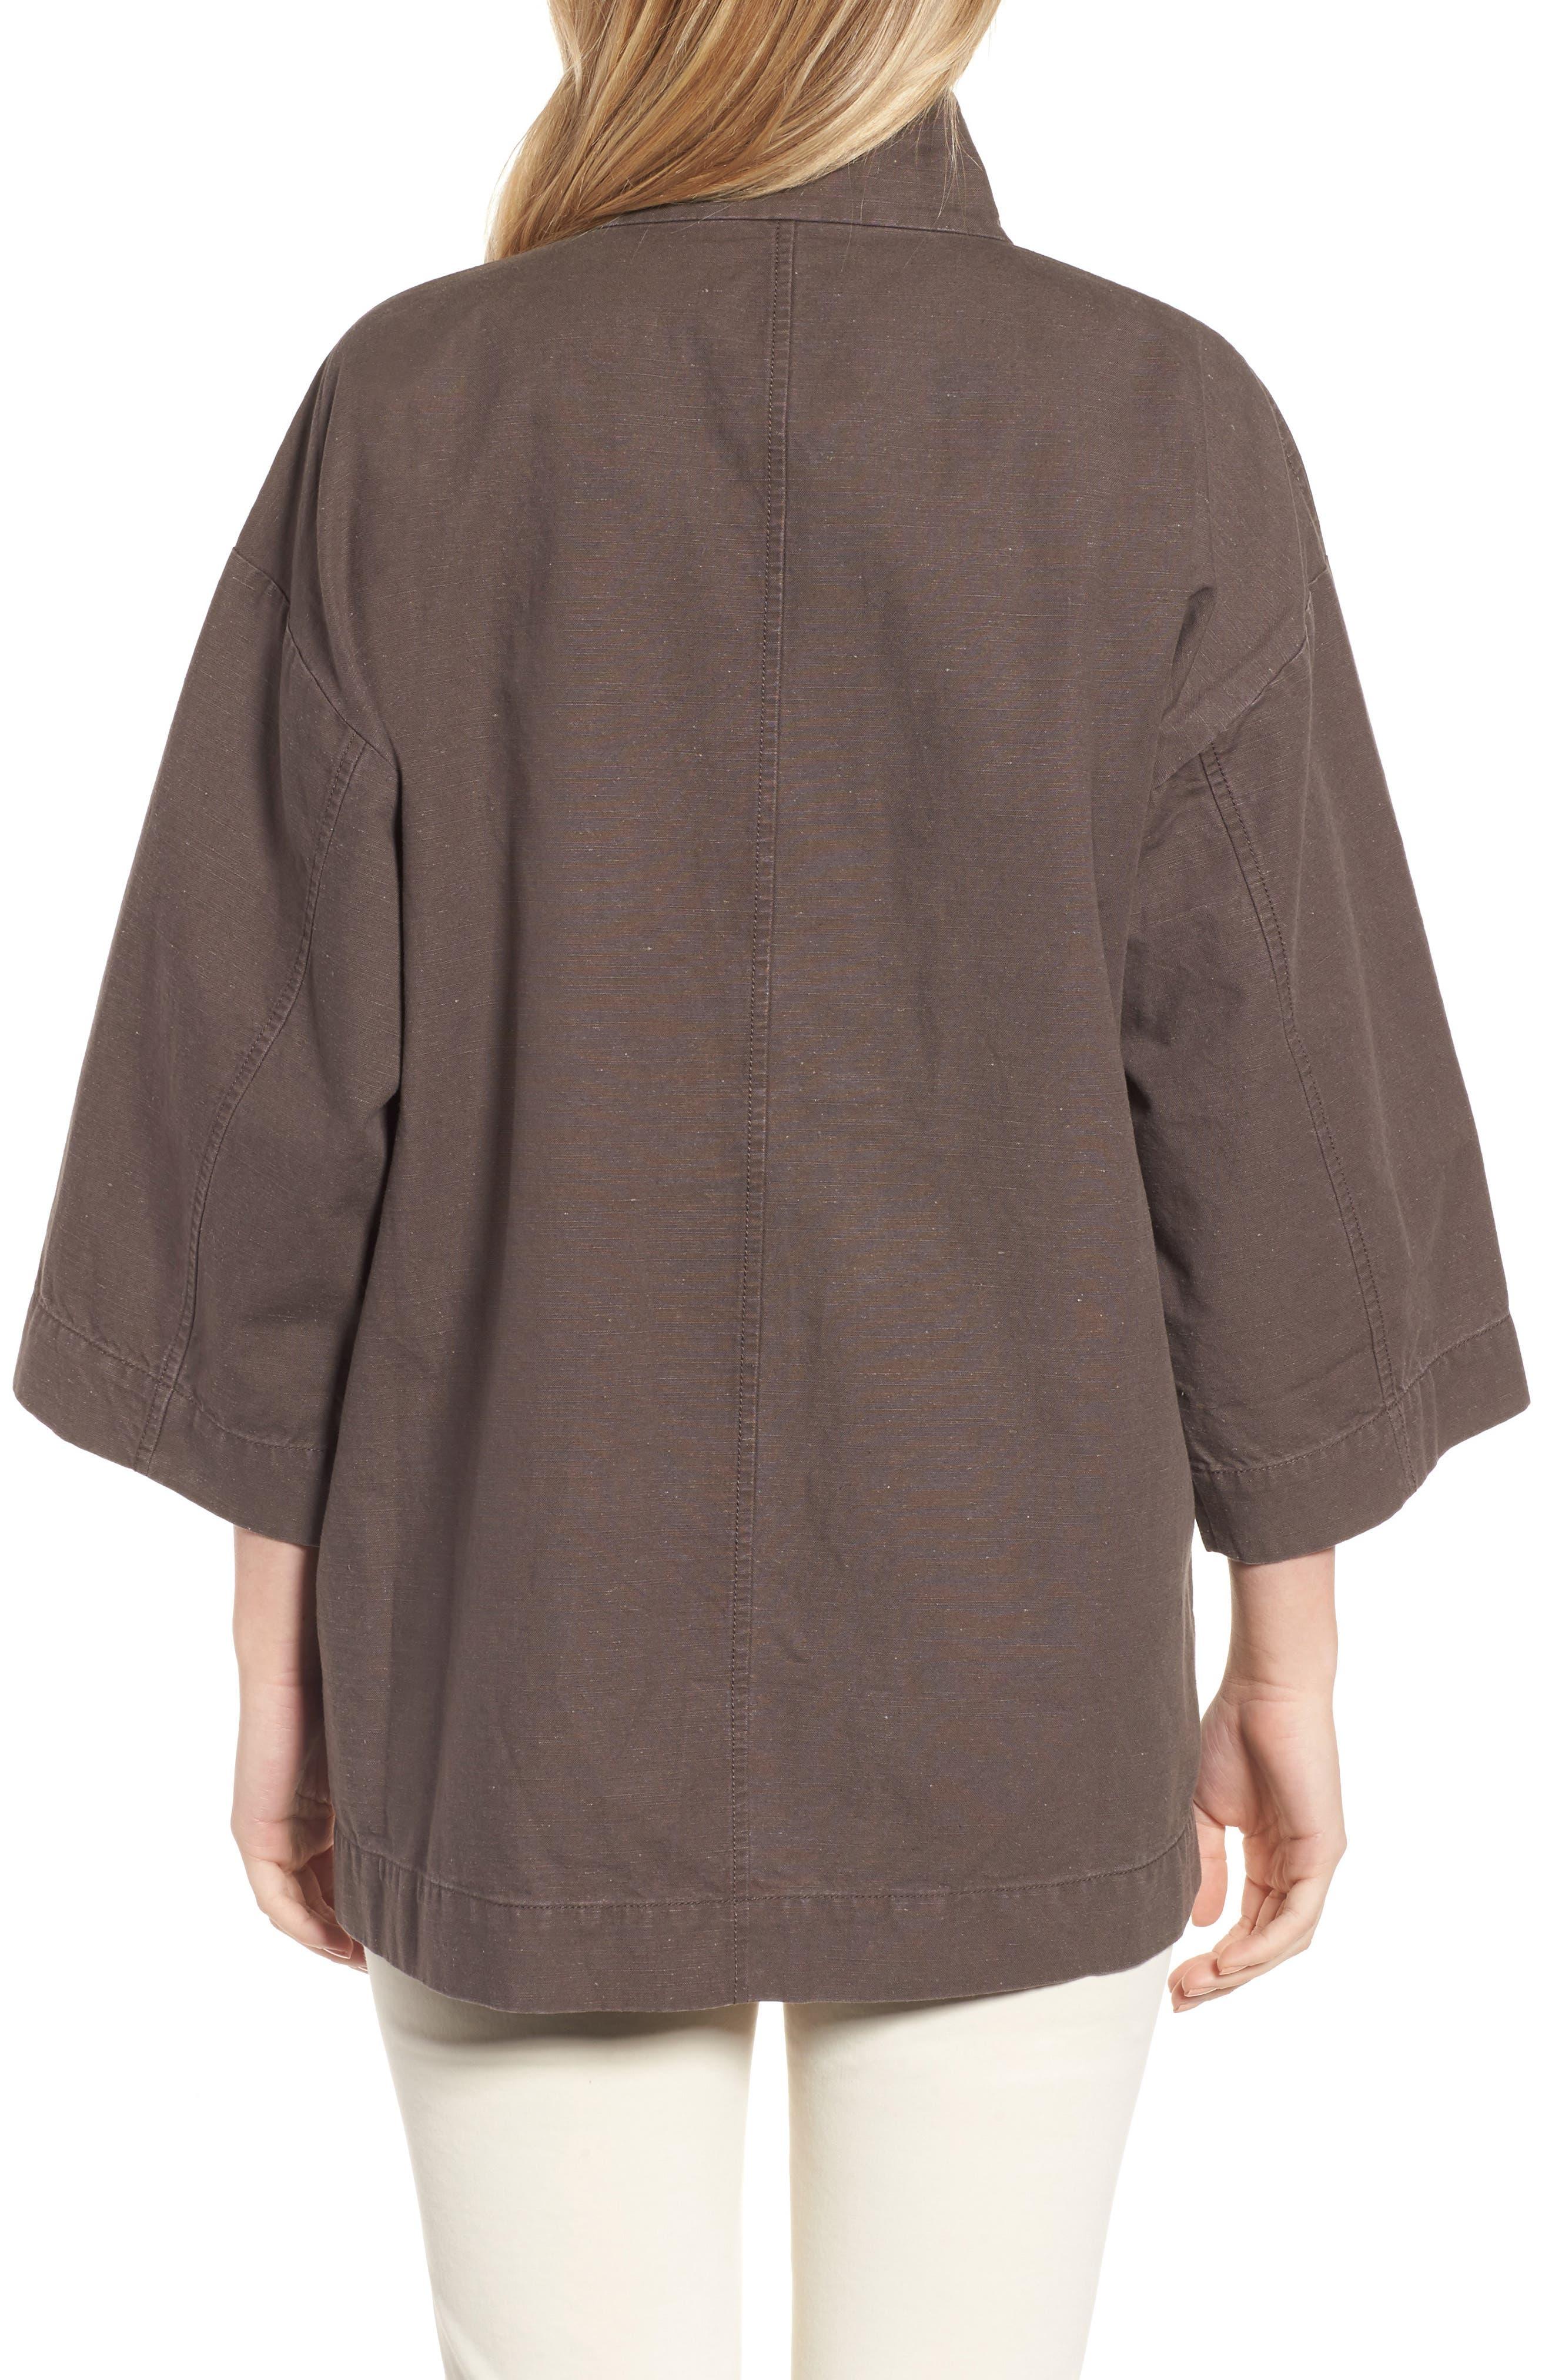 Organic Cotton & Hemp Jacket,                             Alternate thumbnail 2, color,                             024